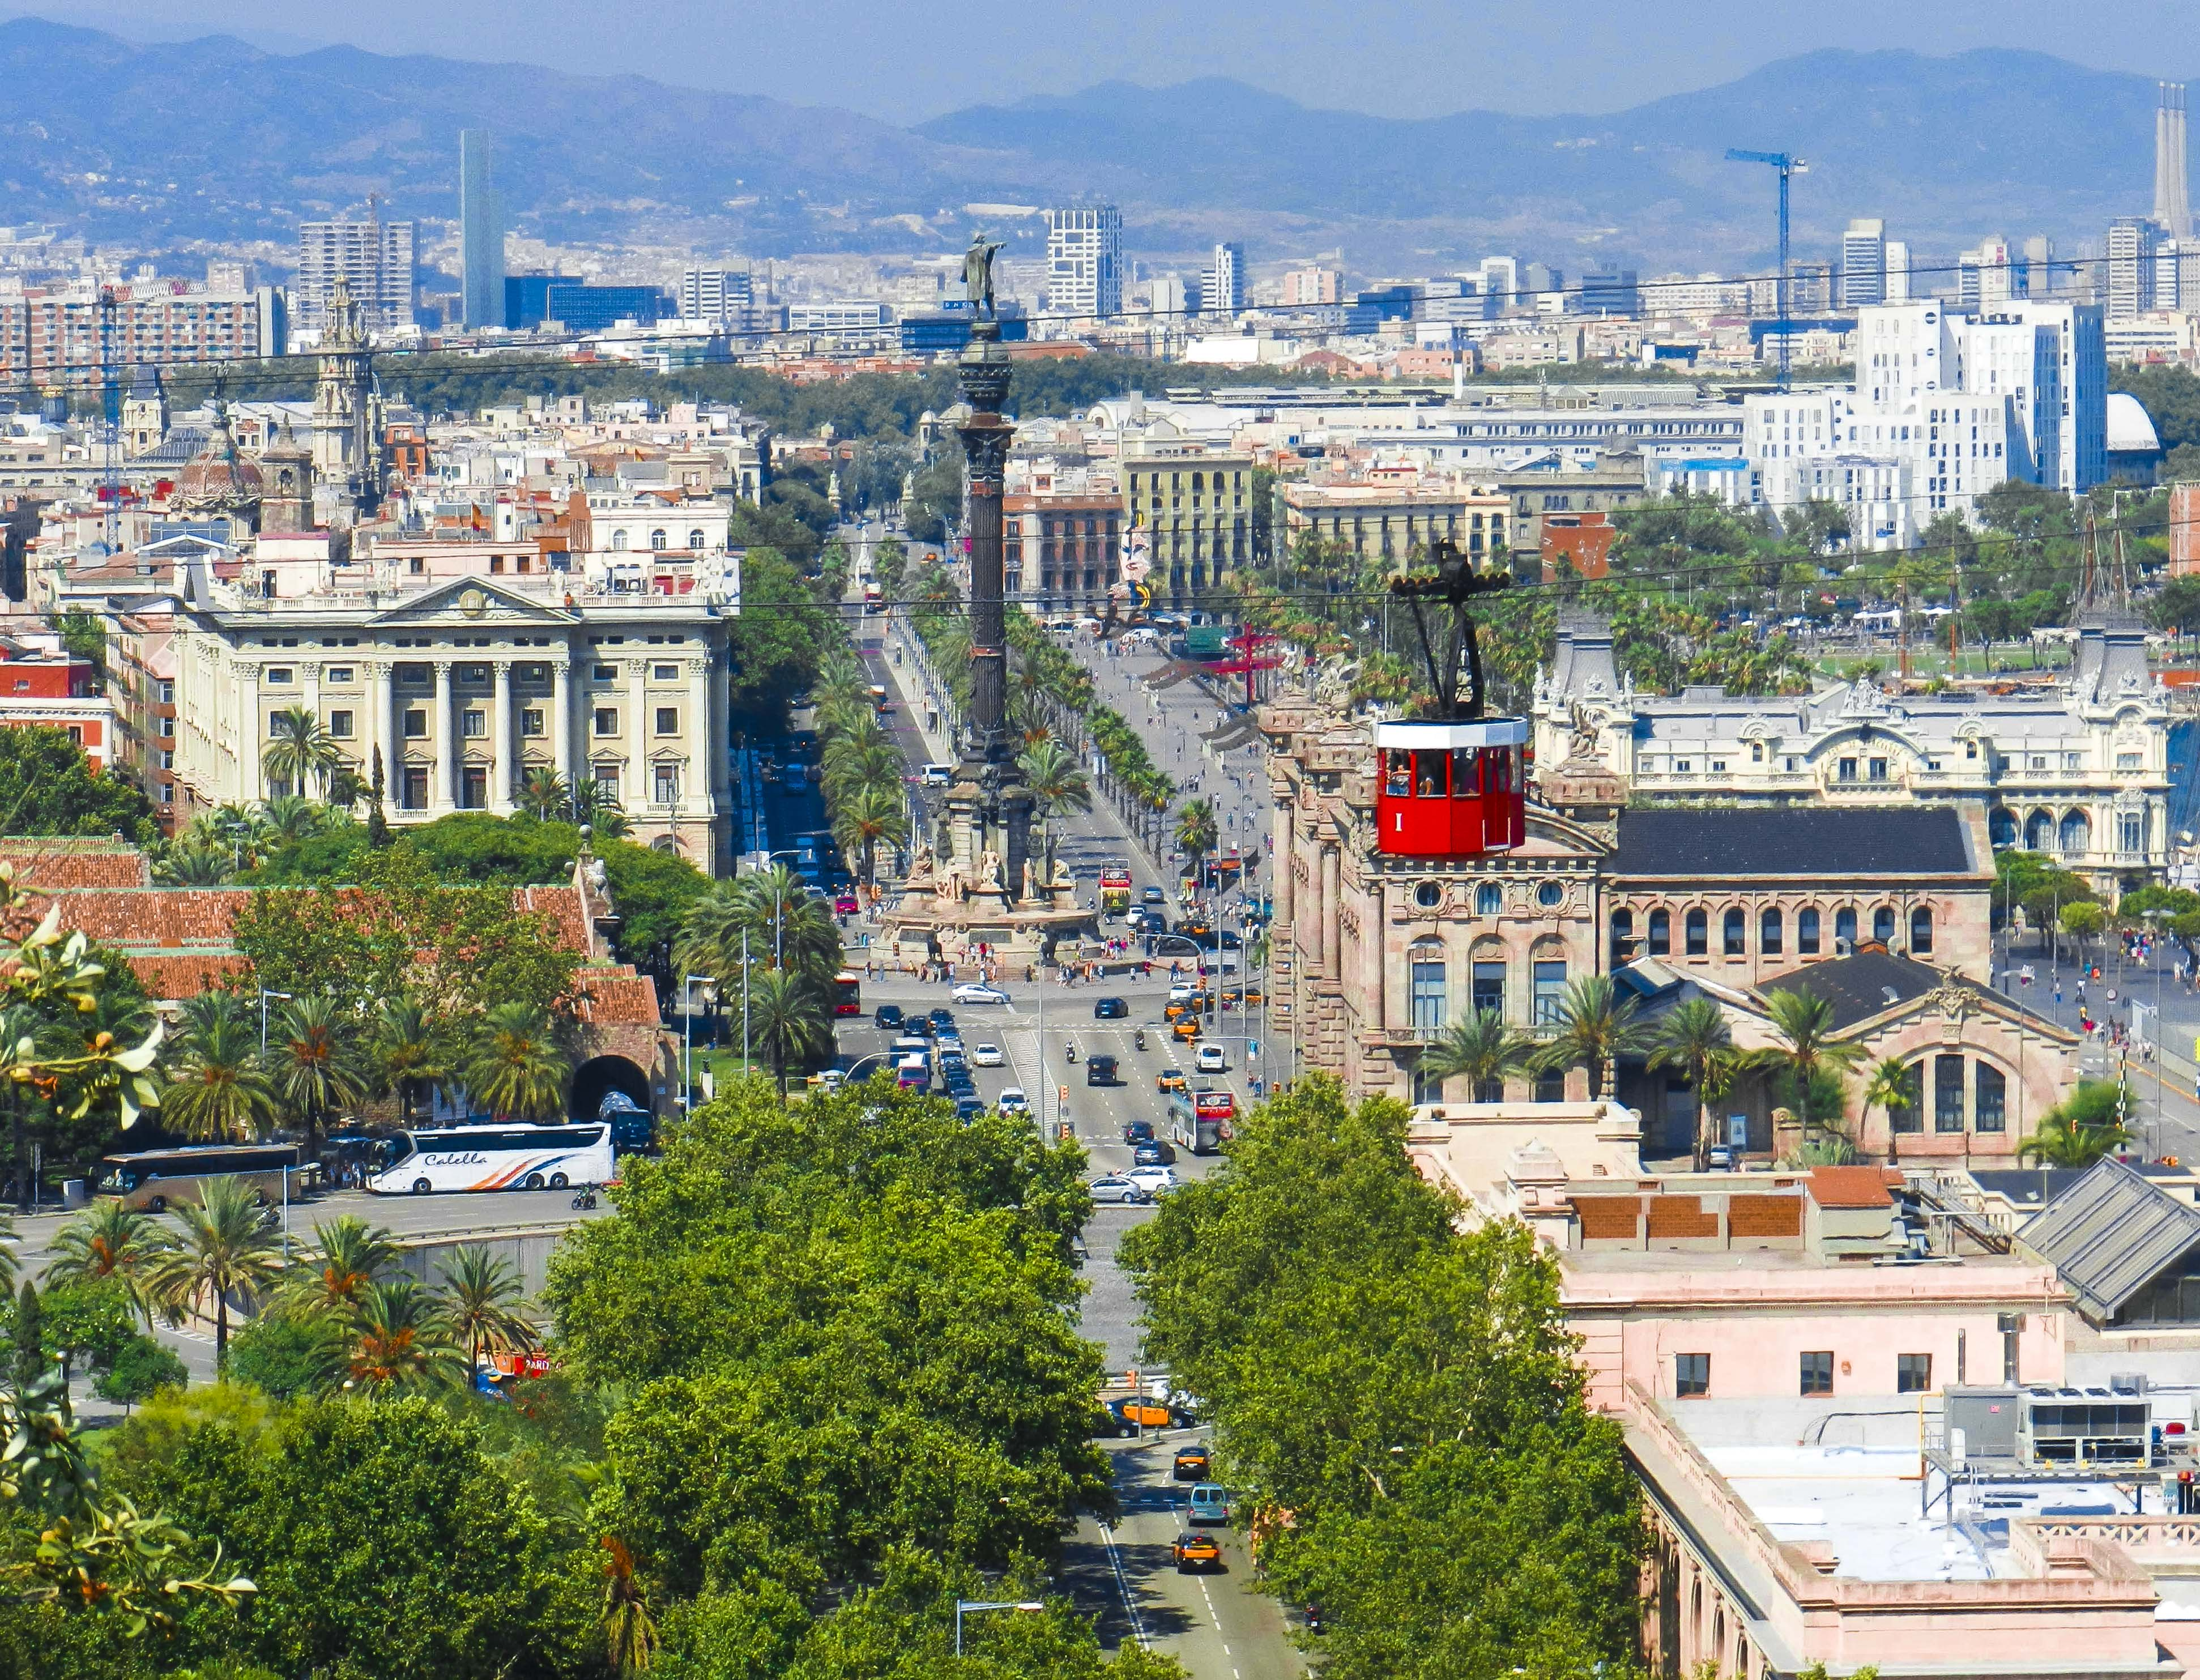 Platz 2: Barcelona, Spanien